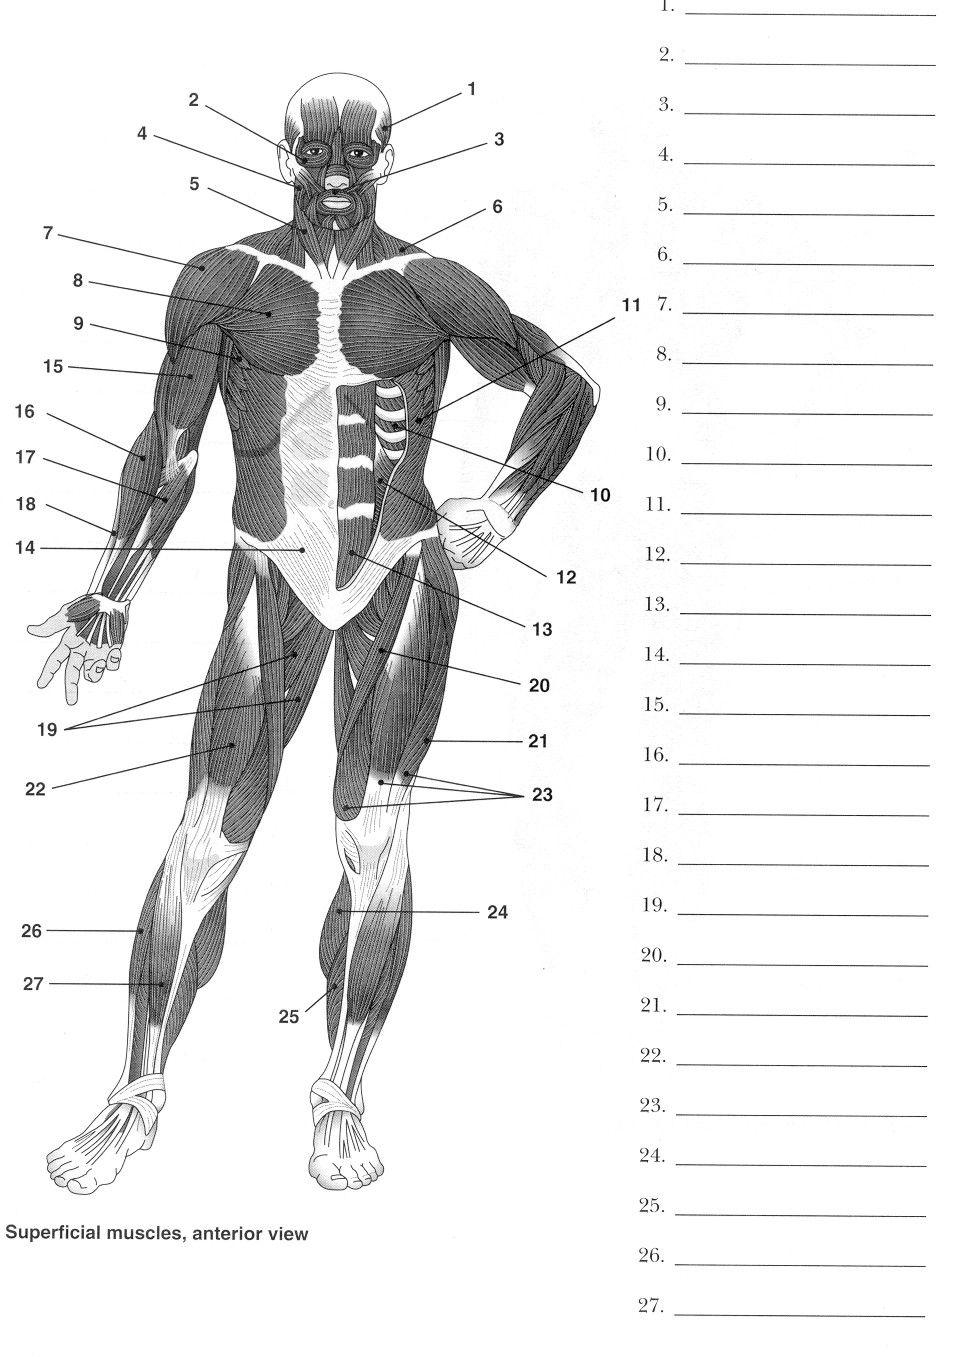 Human Body Muscle Diagram Worksheet